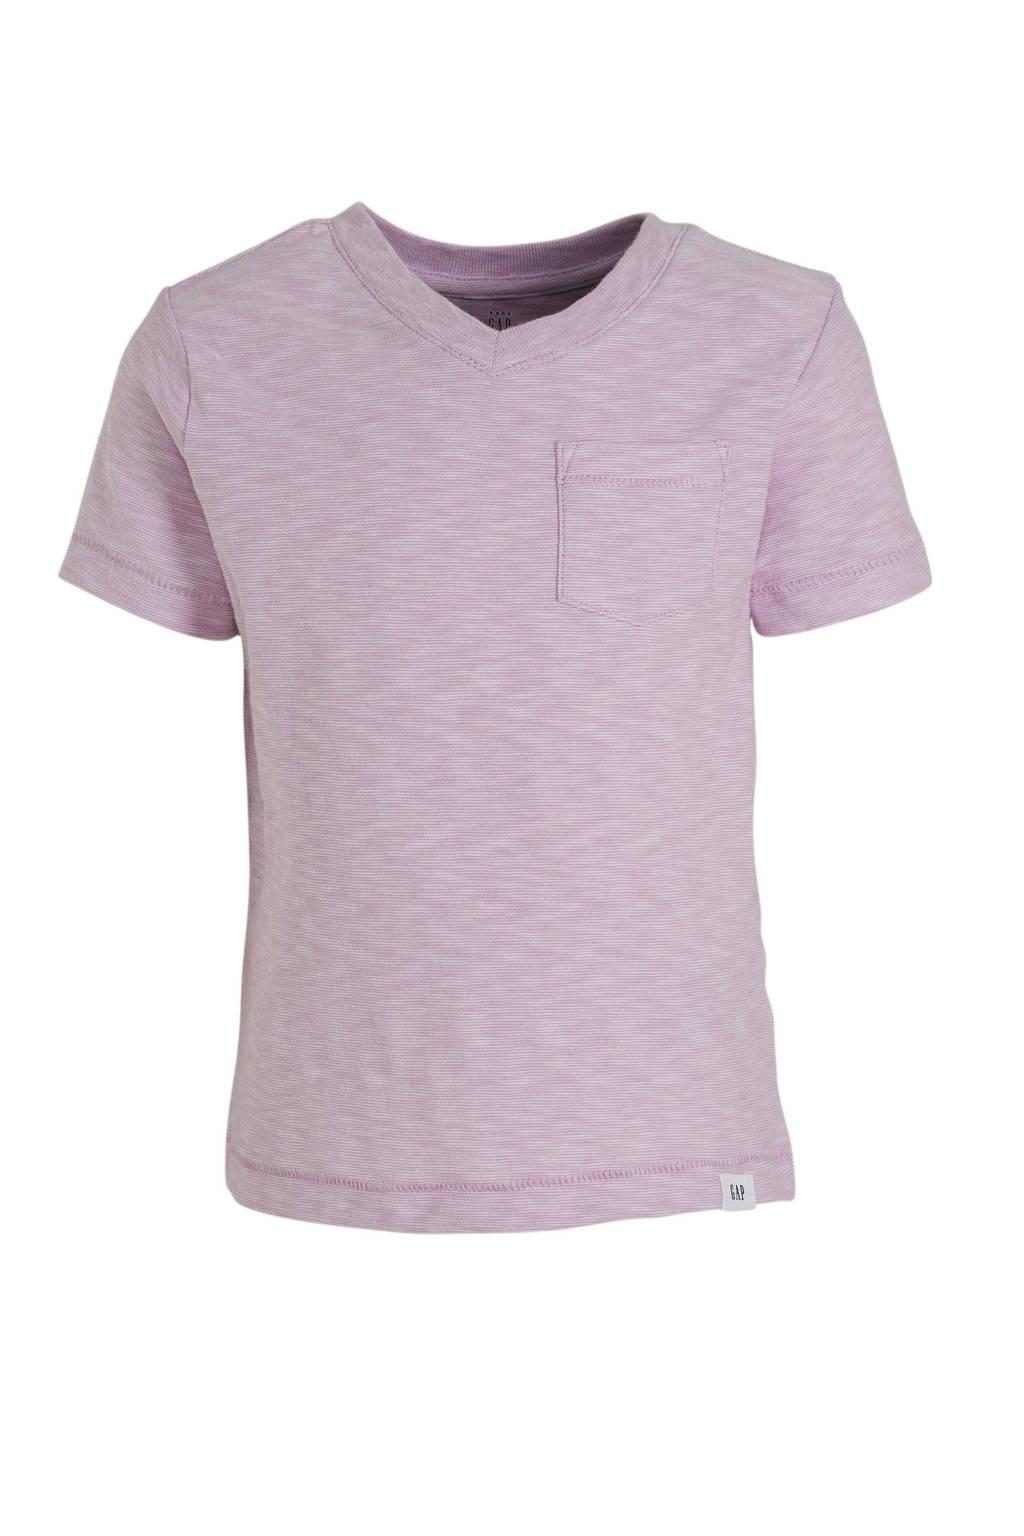 GAP gestreept T-shirt paars/wit, Paars/wit